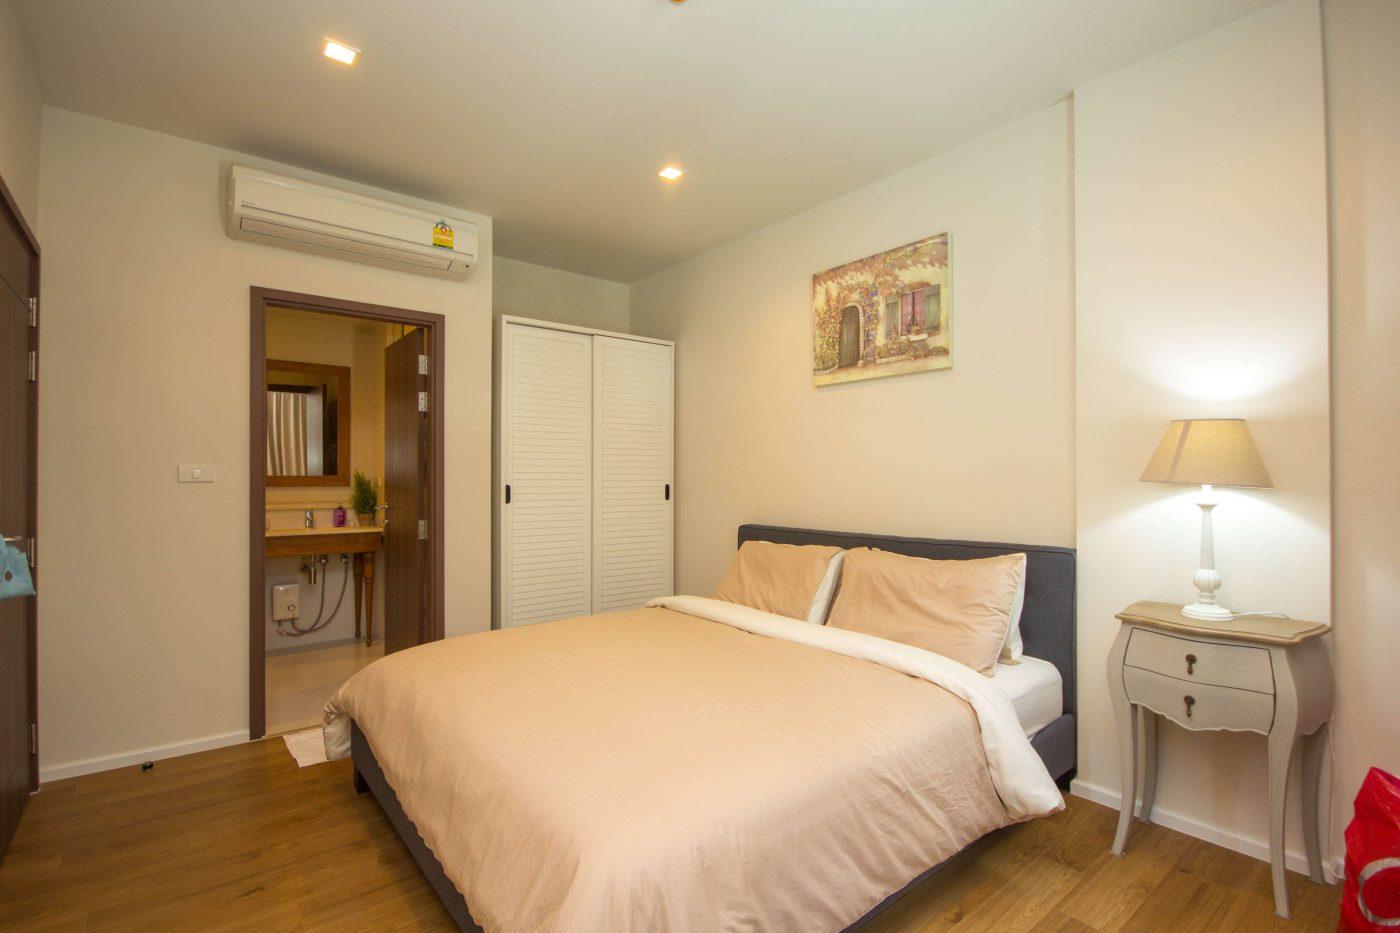 2 bedroom villa for sale